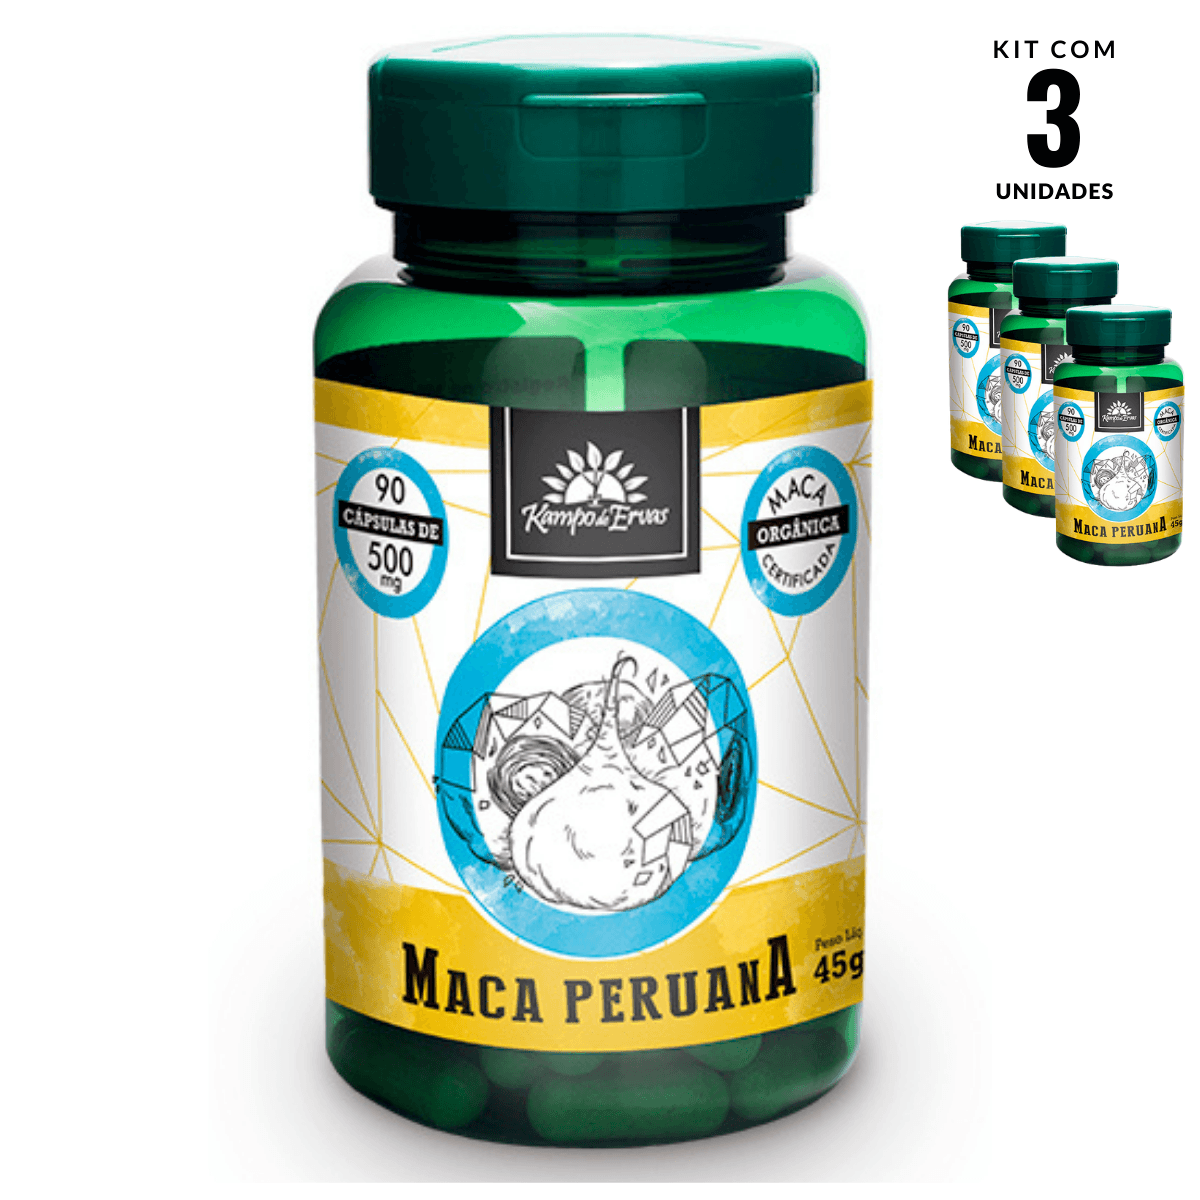 Maca Peruana Orgânica Import 500mg Kampo Ervas 3un 90cáp cad